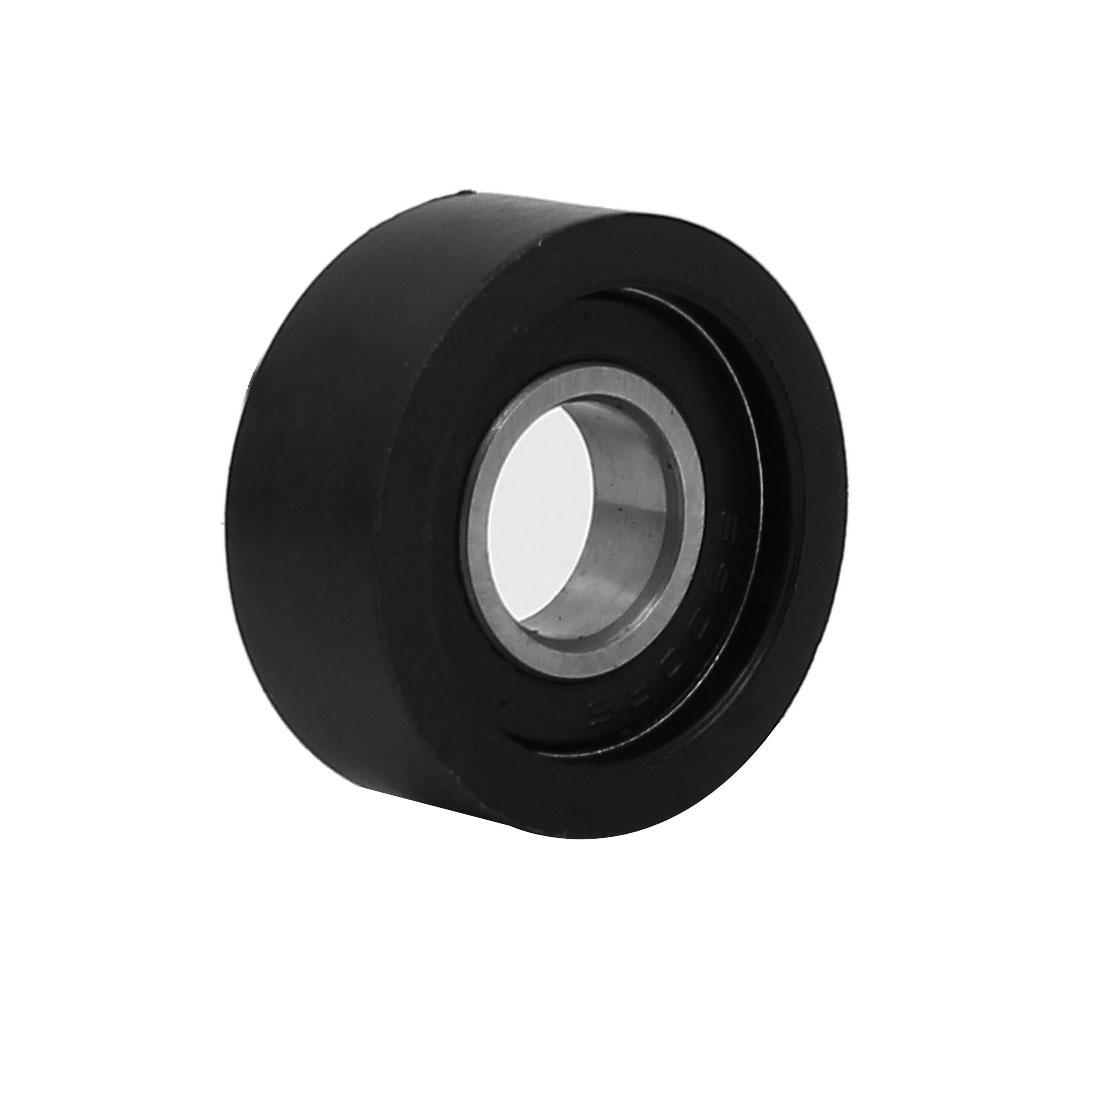 10mm x26mm x 10mm POM Roller Ball Bearing Pulley Sliding Converyor Wheel